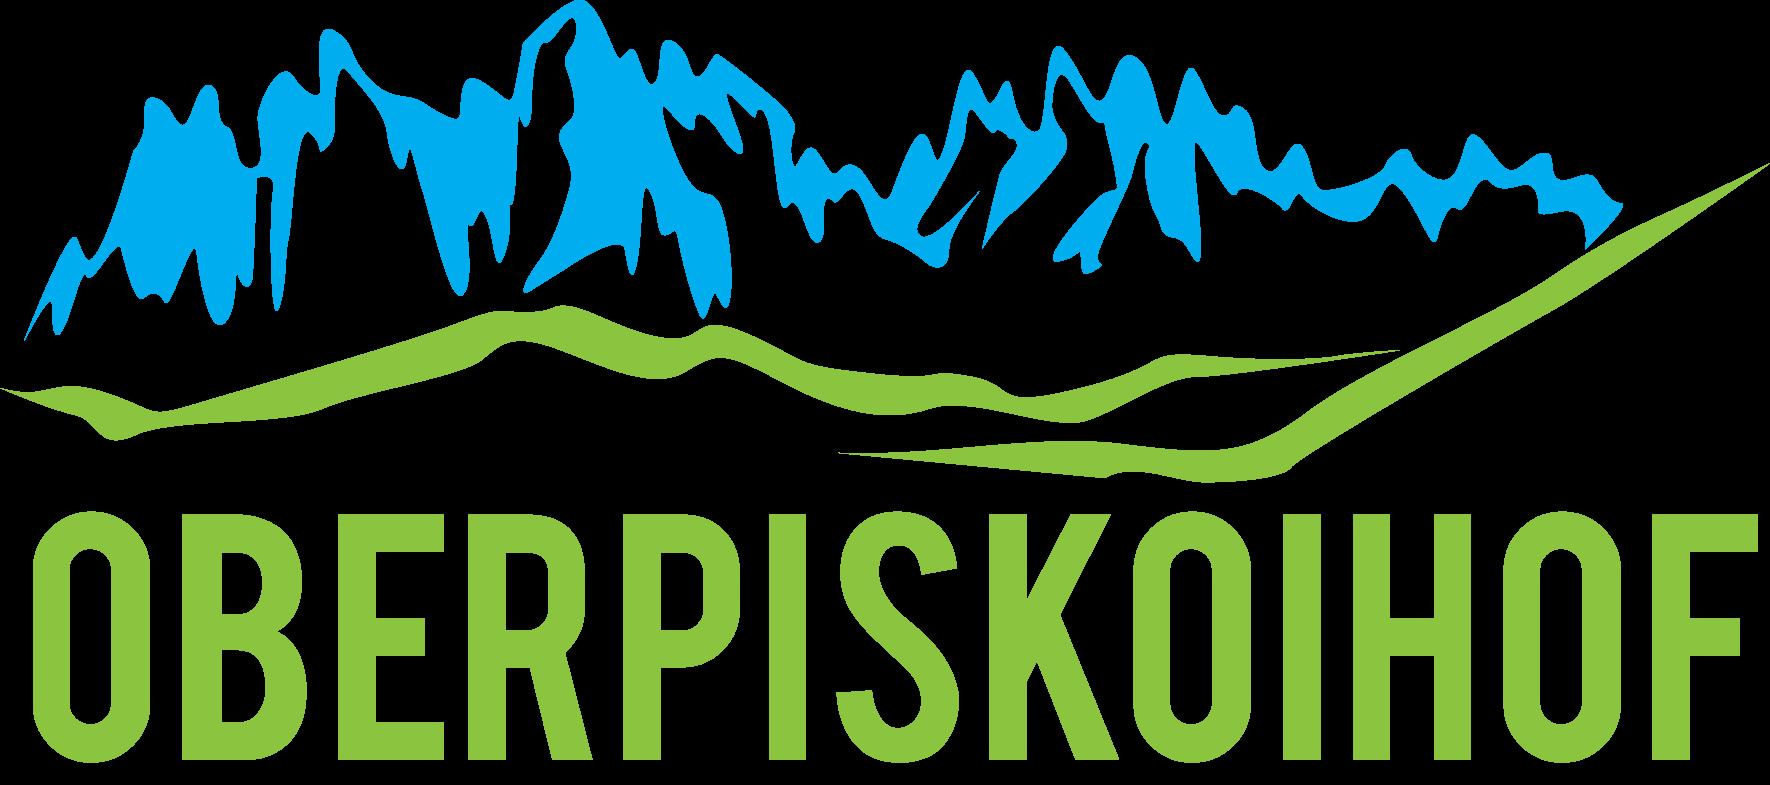 Oberpiskoihof